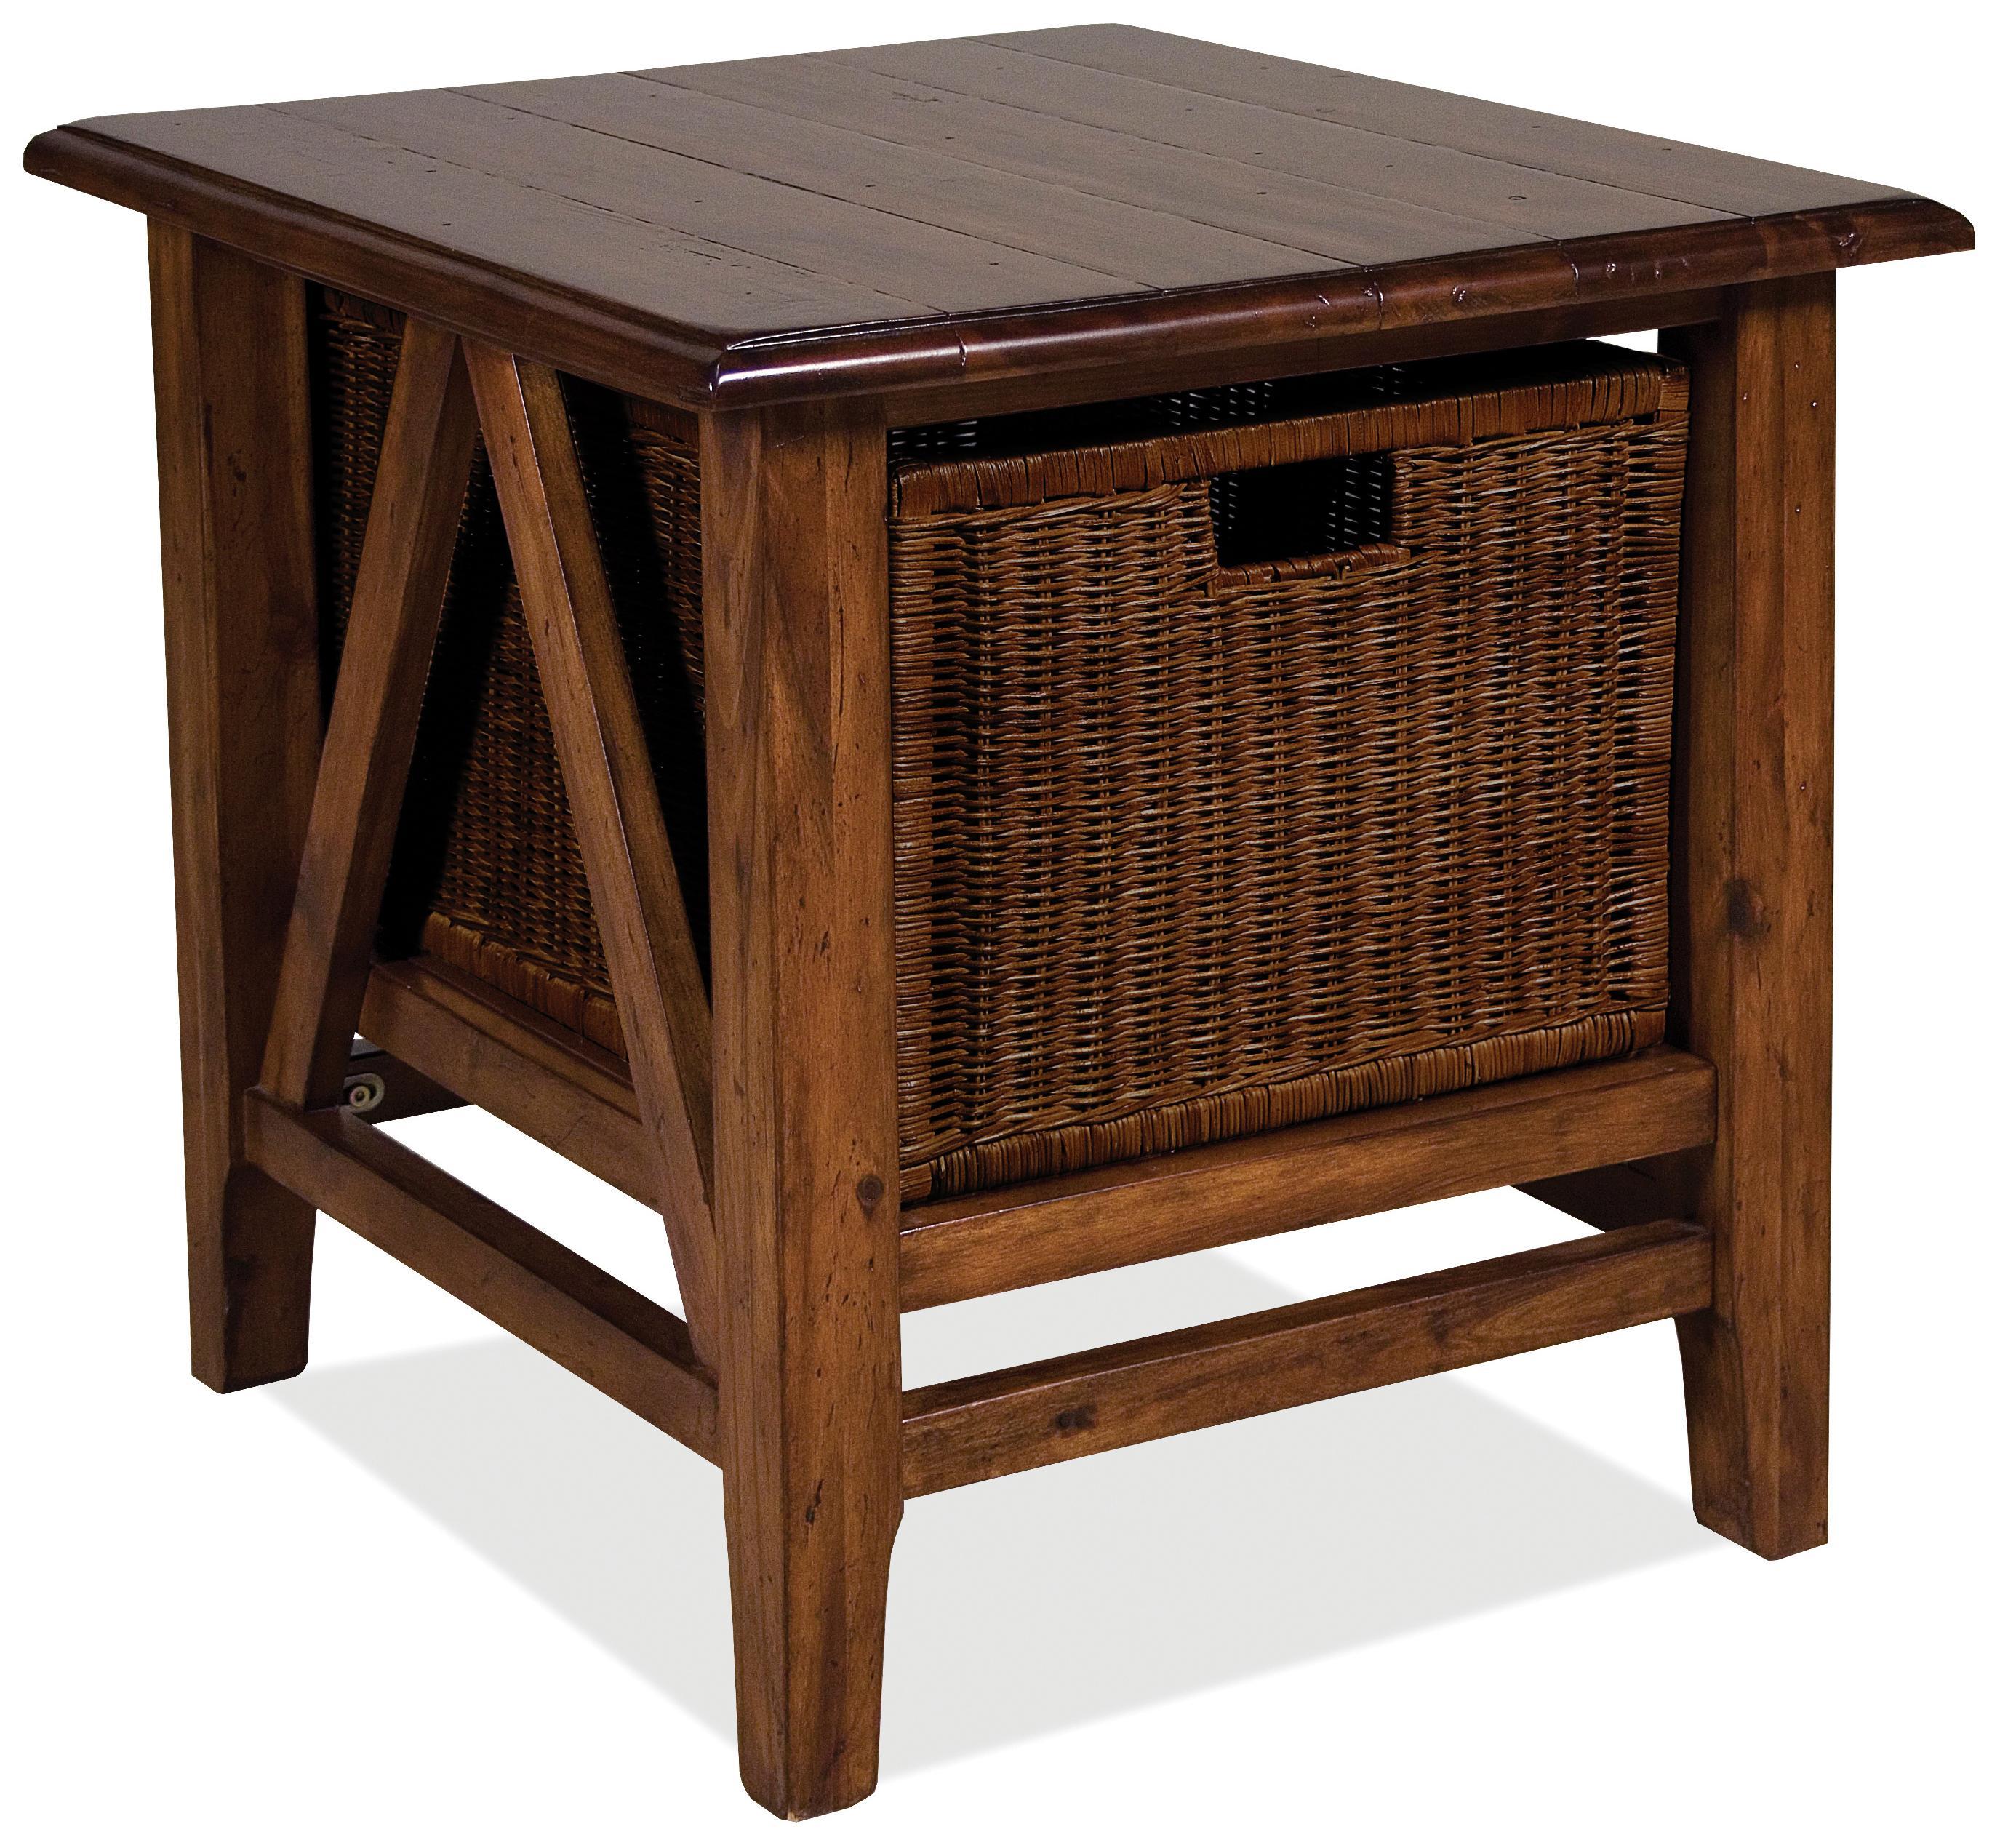 Charmant Rectangular End Table